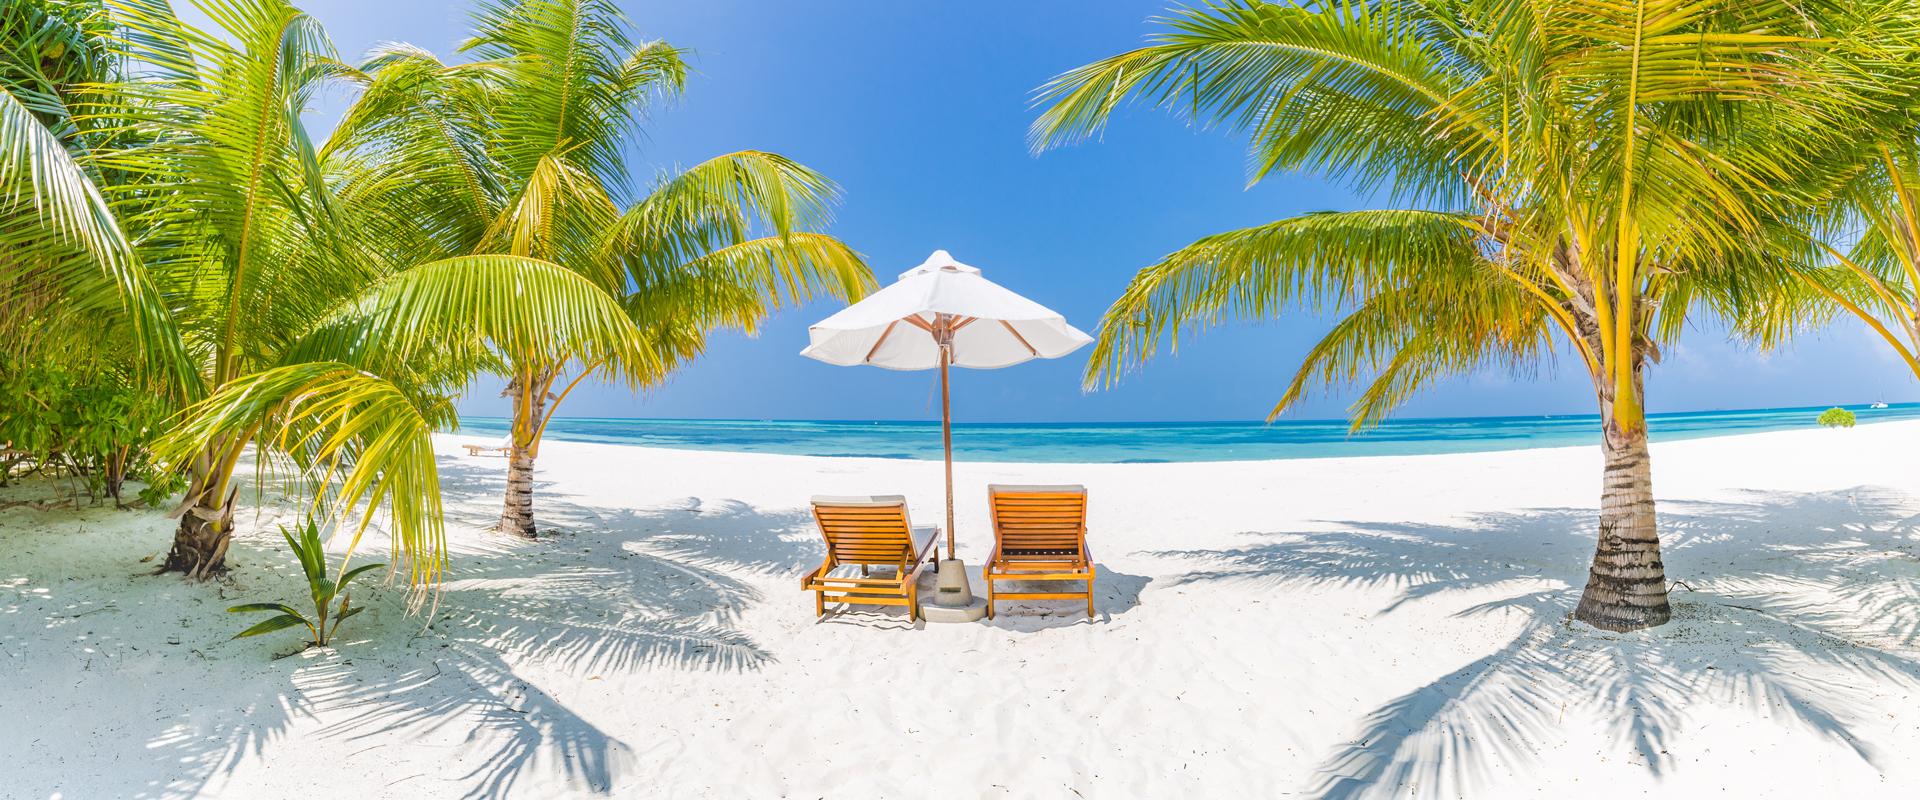 Seychelles   Farniente tropical